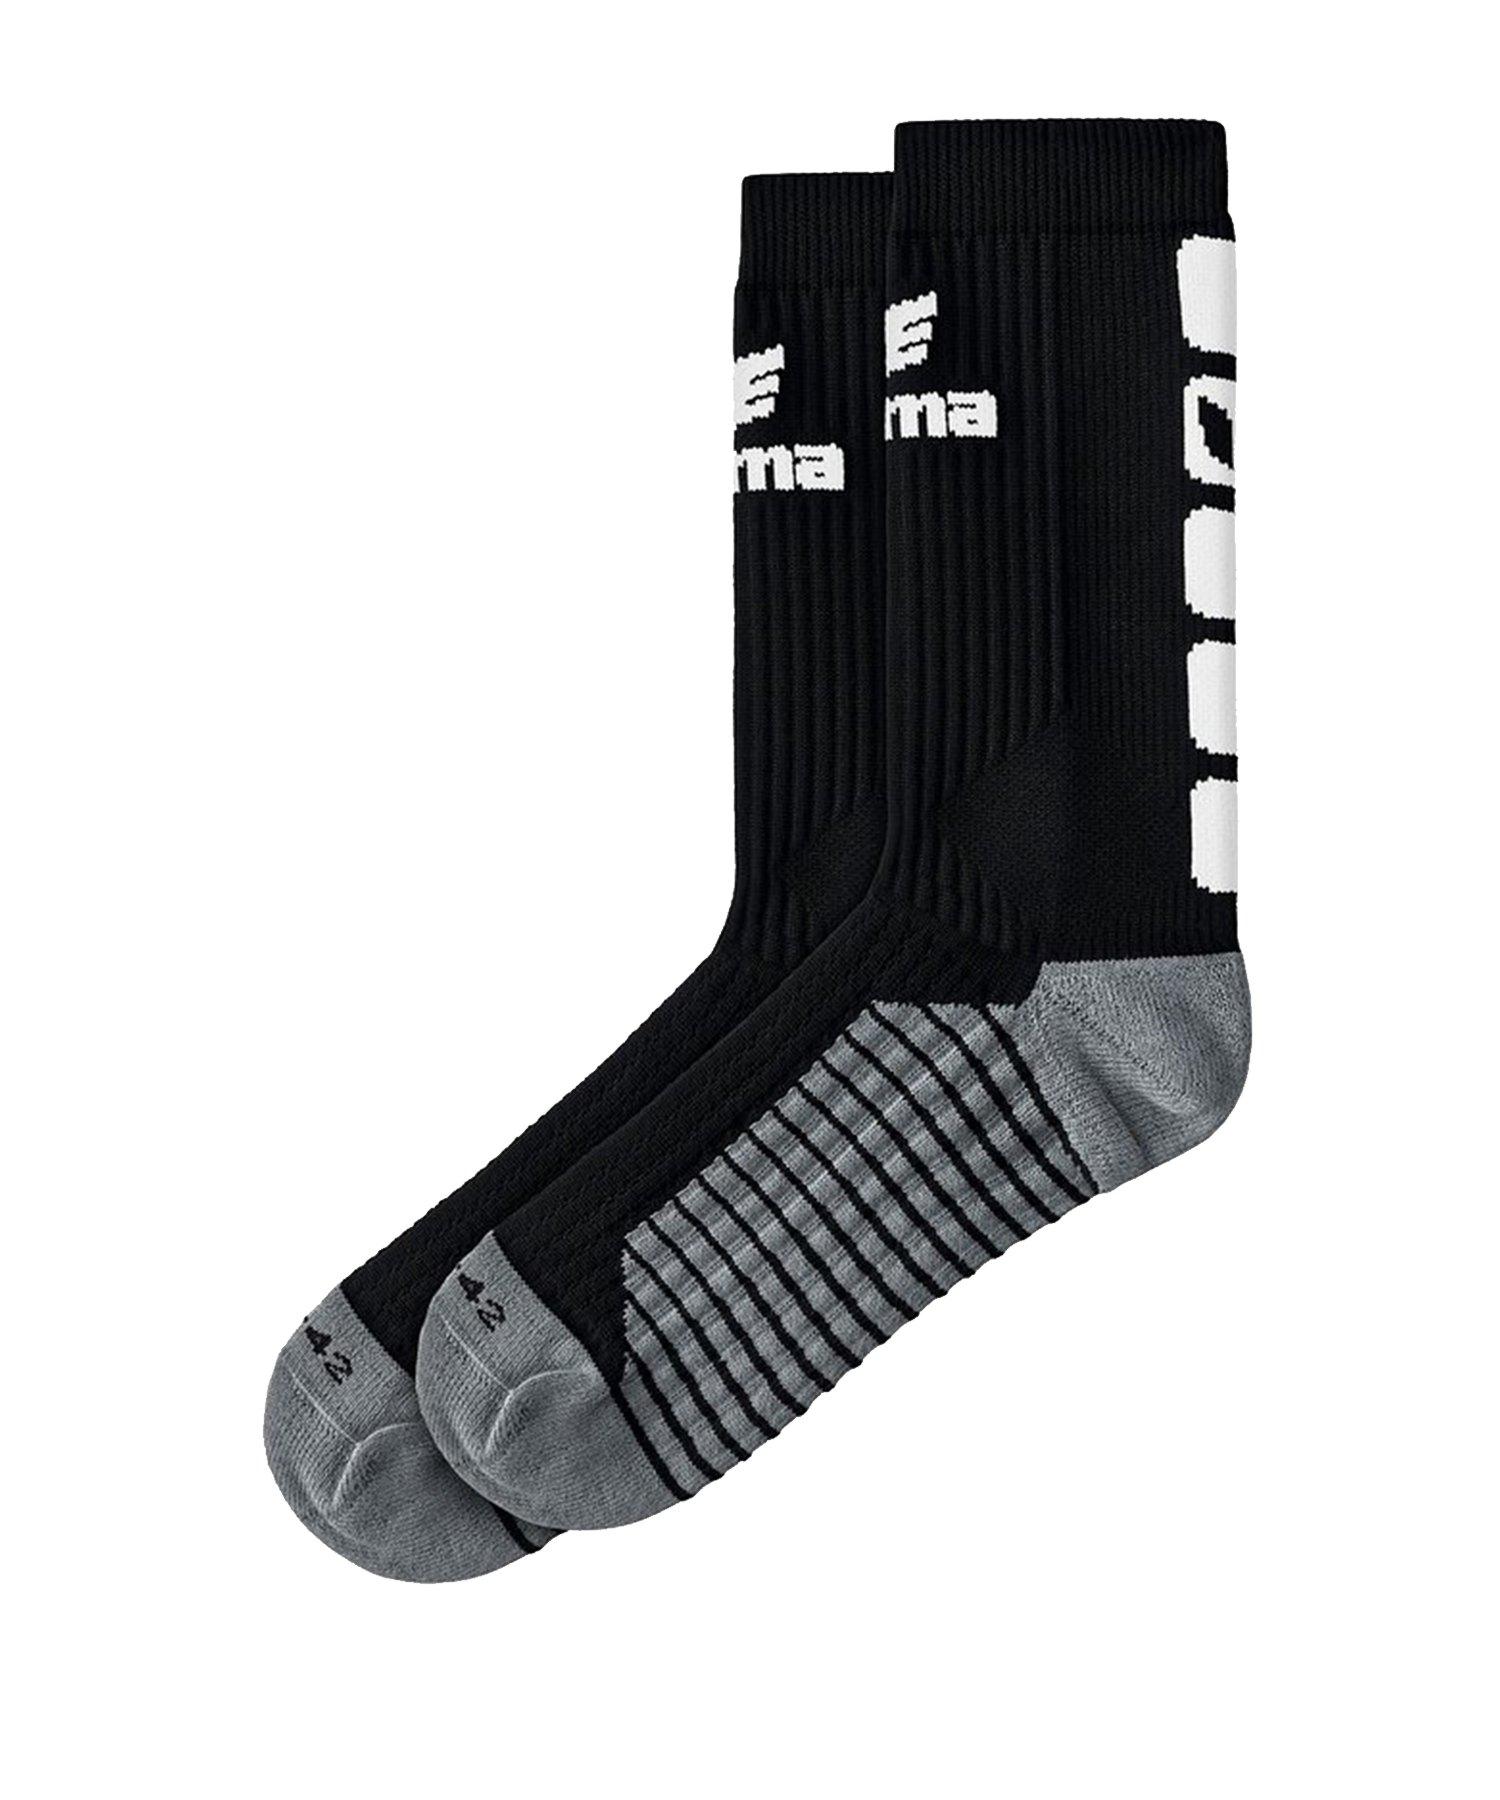 Erima CLASSIC 5-C Socken Schwarz Weiss - Schwarz